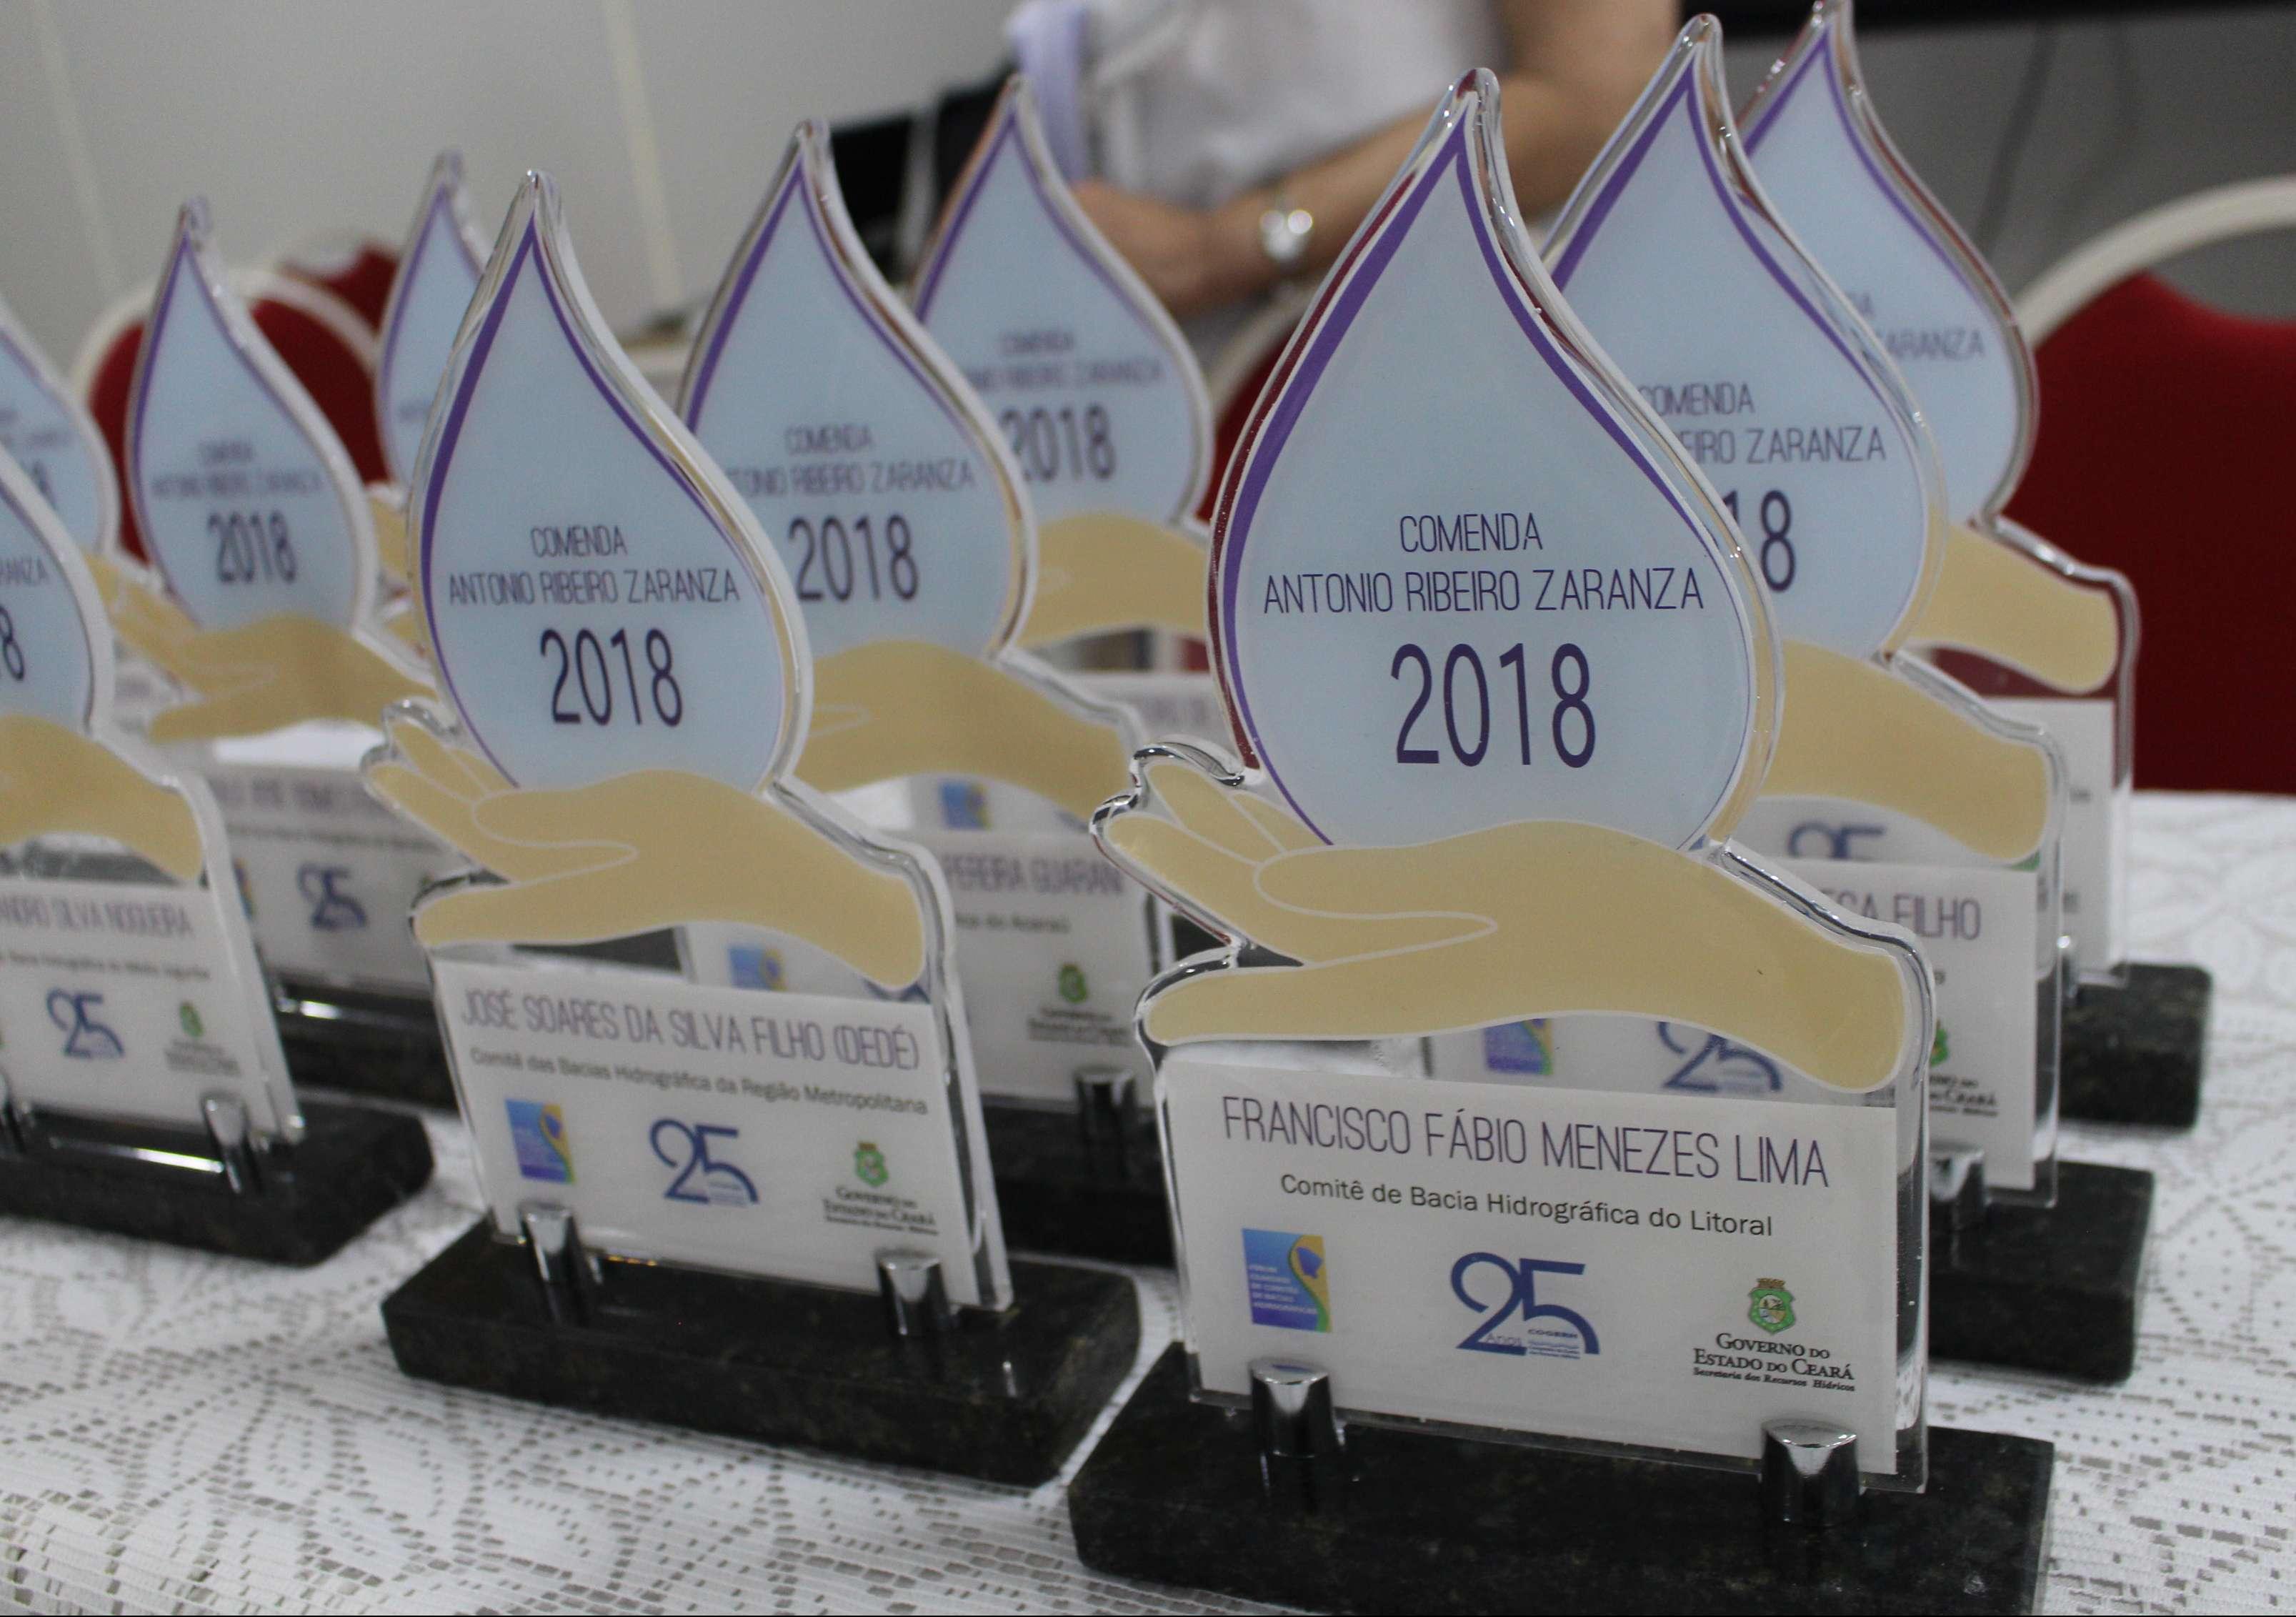 Personalidades do setor de Recursos Hídricos do Ceará recebem Comenda Zaranza